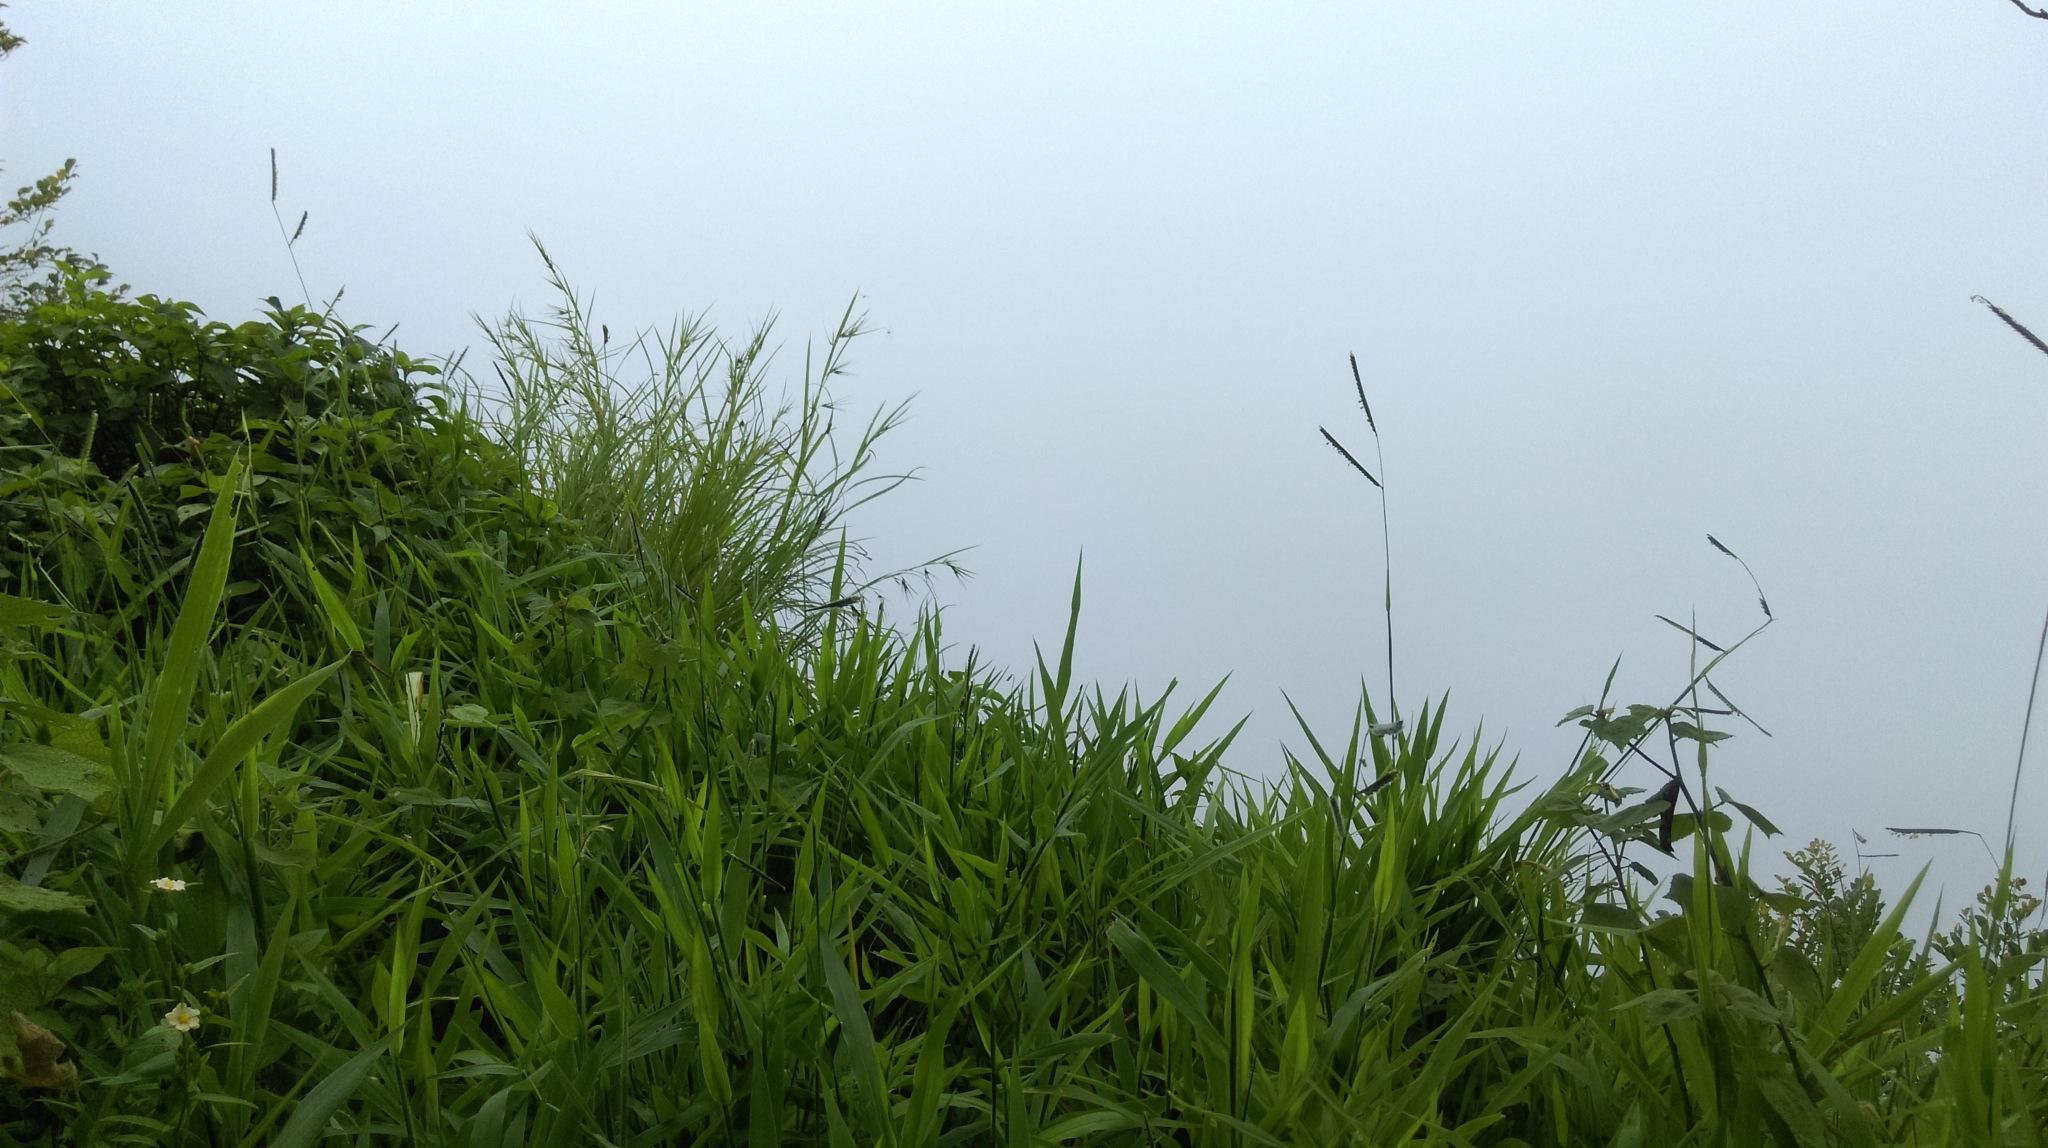 Grass by Gokul Wunderbar